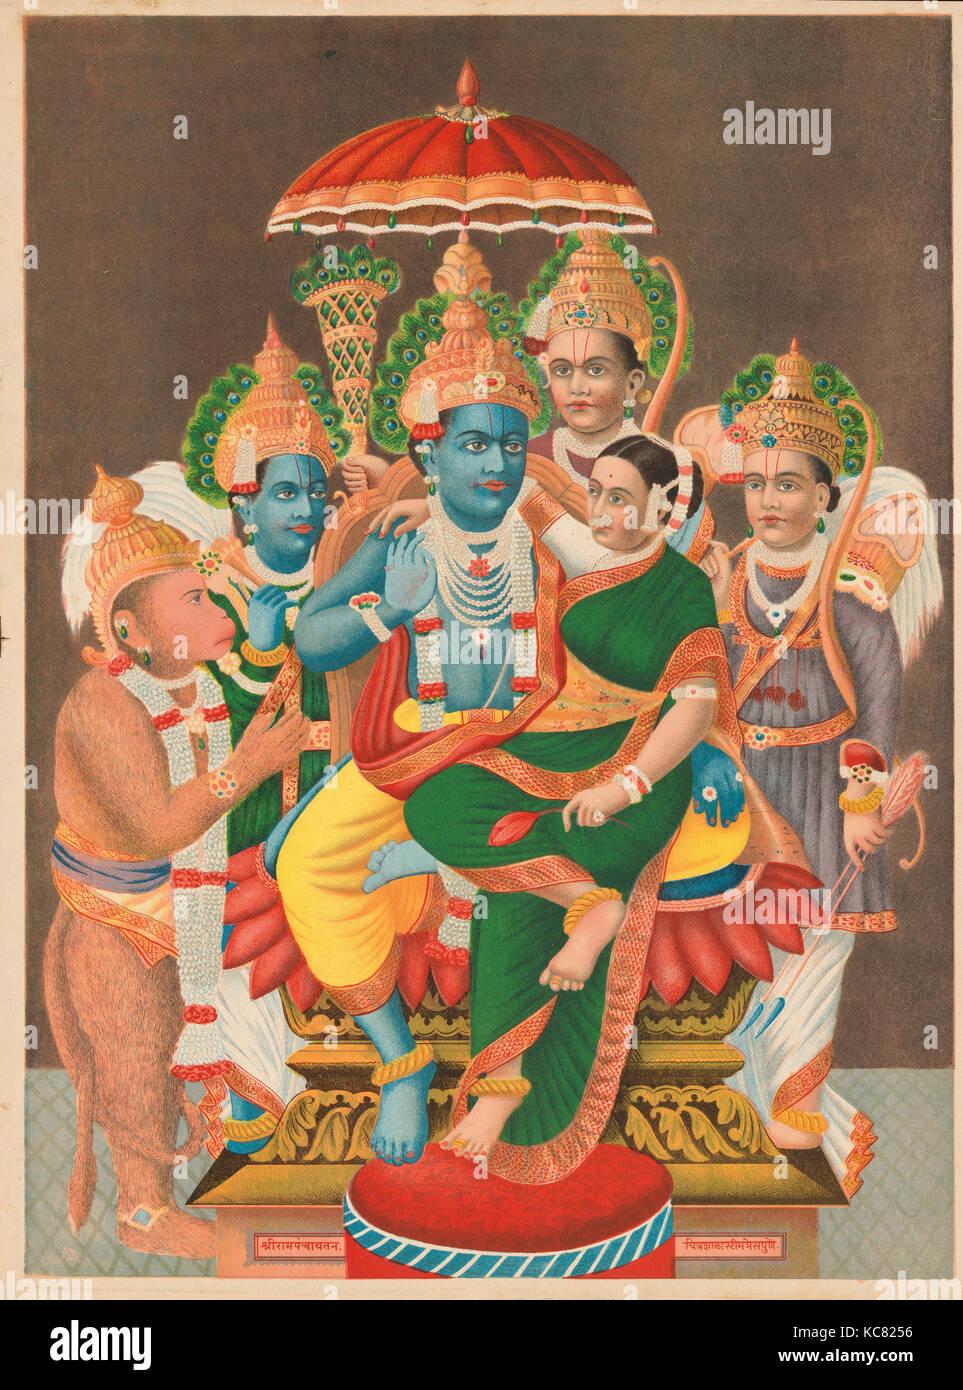 Rampanchayatam (Ram's assembly), 1878 (?), India, Chromolithographic print on paper, Image: 19 × 14 in. (48.3 - Stock Image